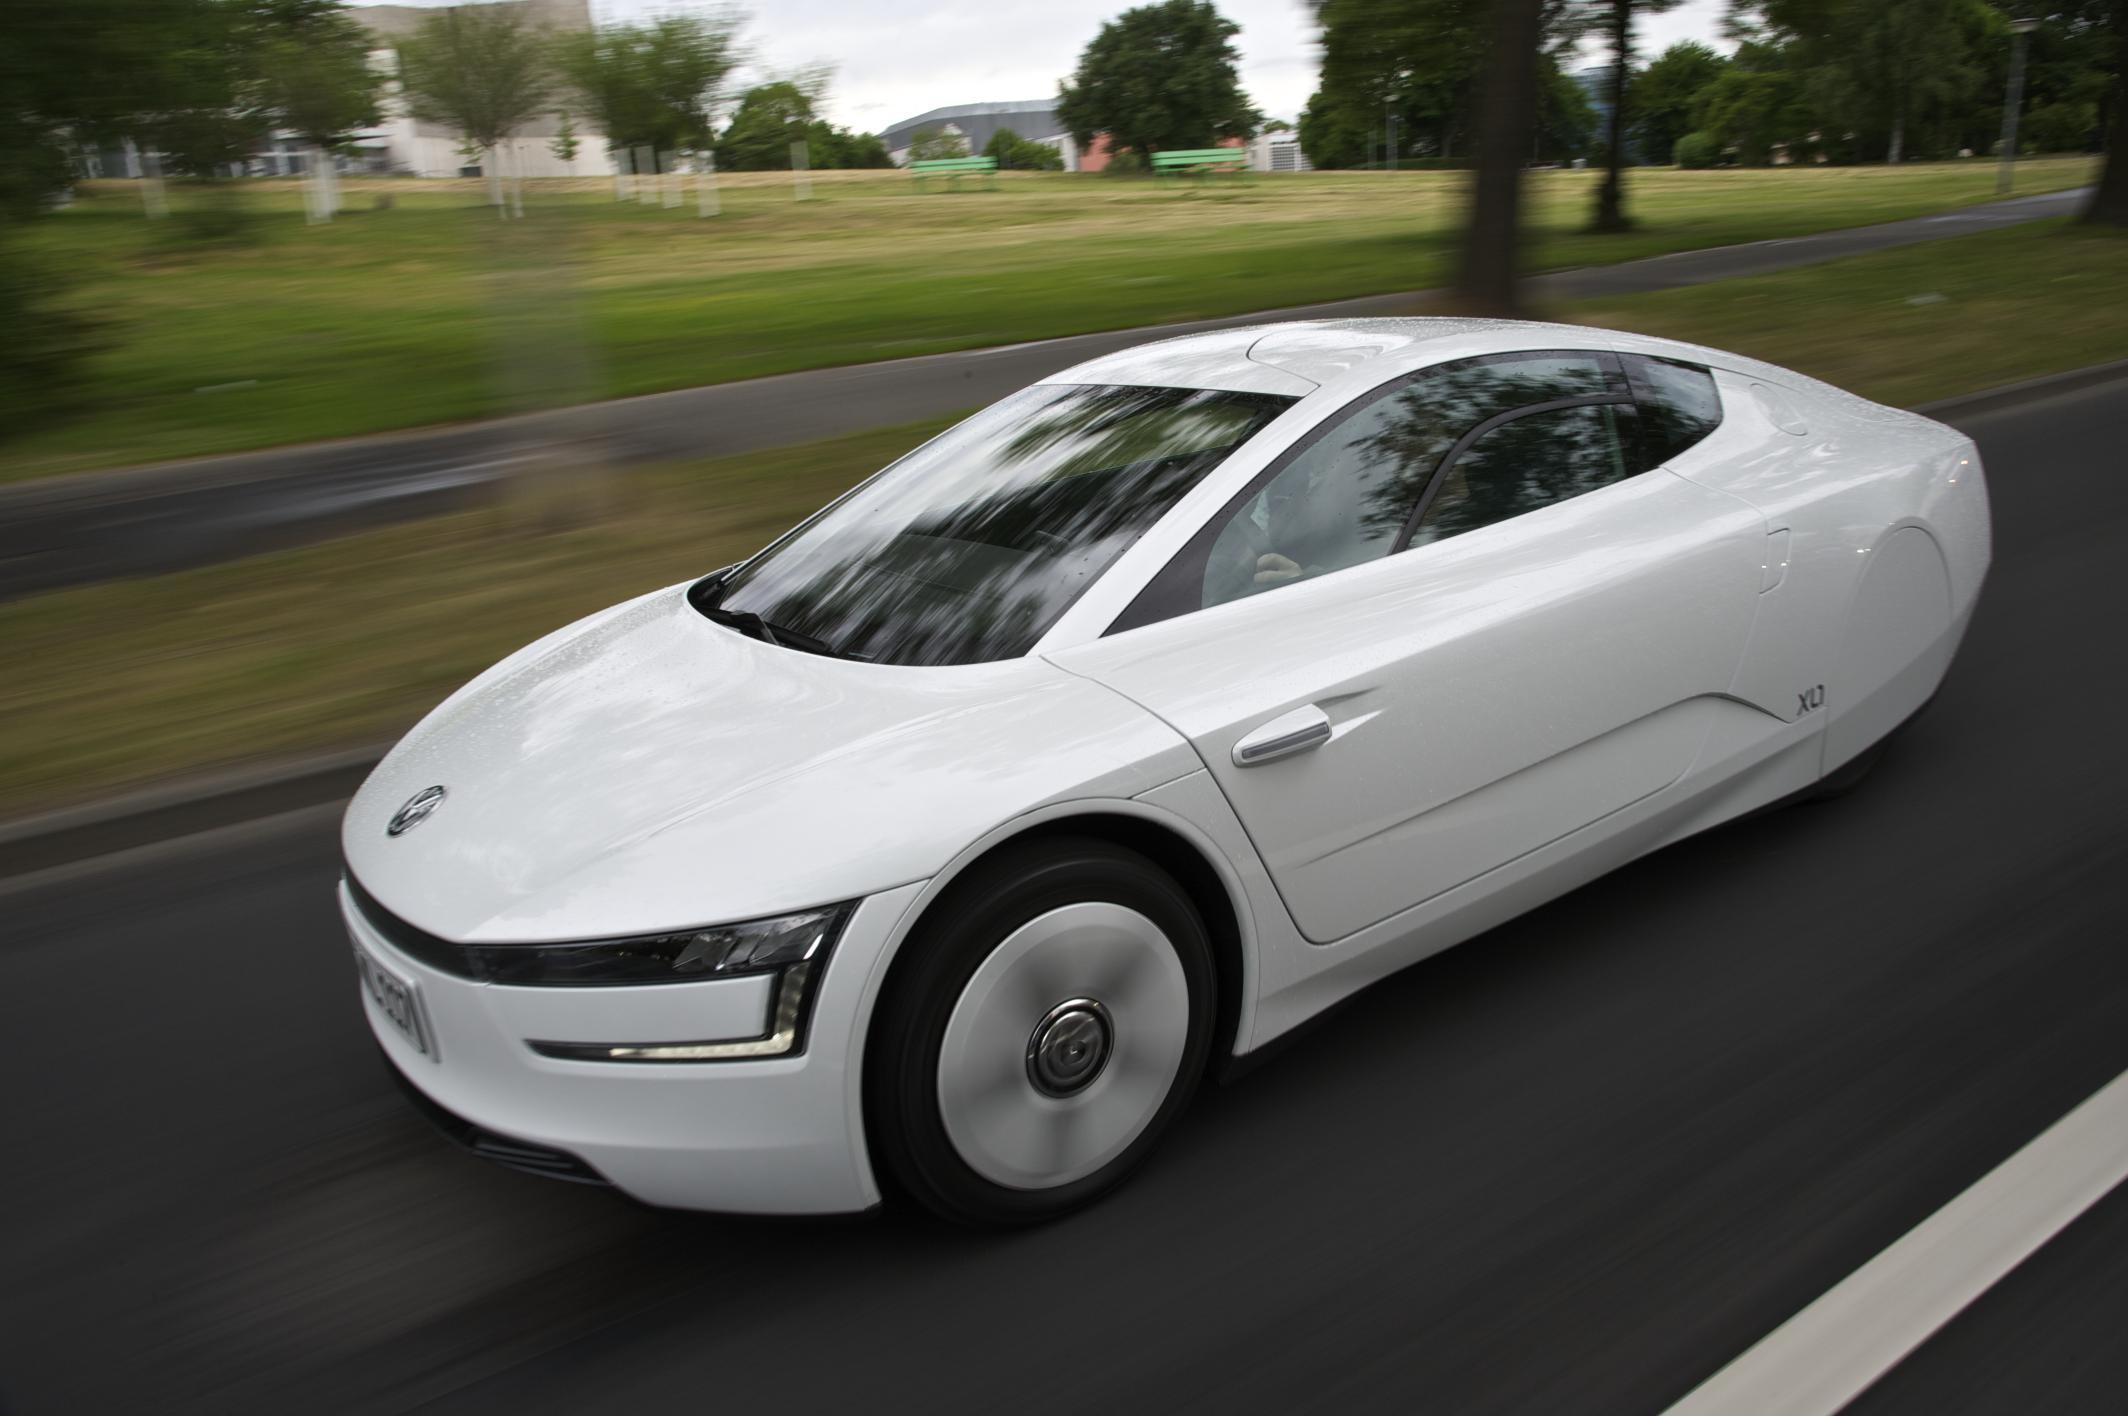 Zanimljivost dana: Rekorder Volkswagen XL1